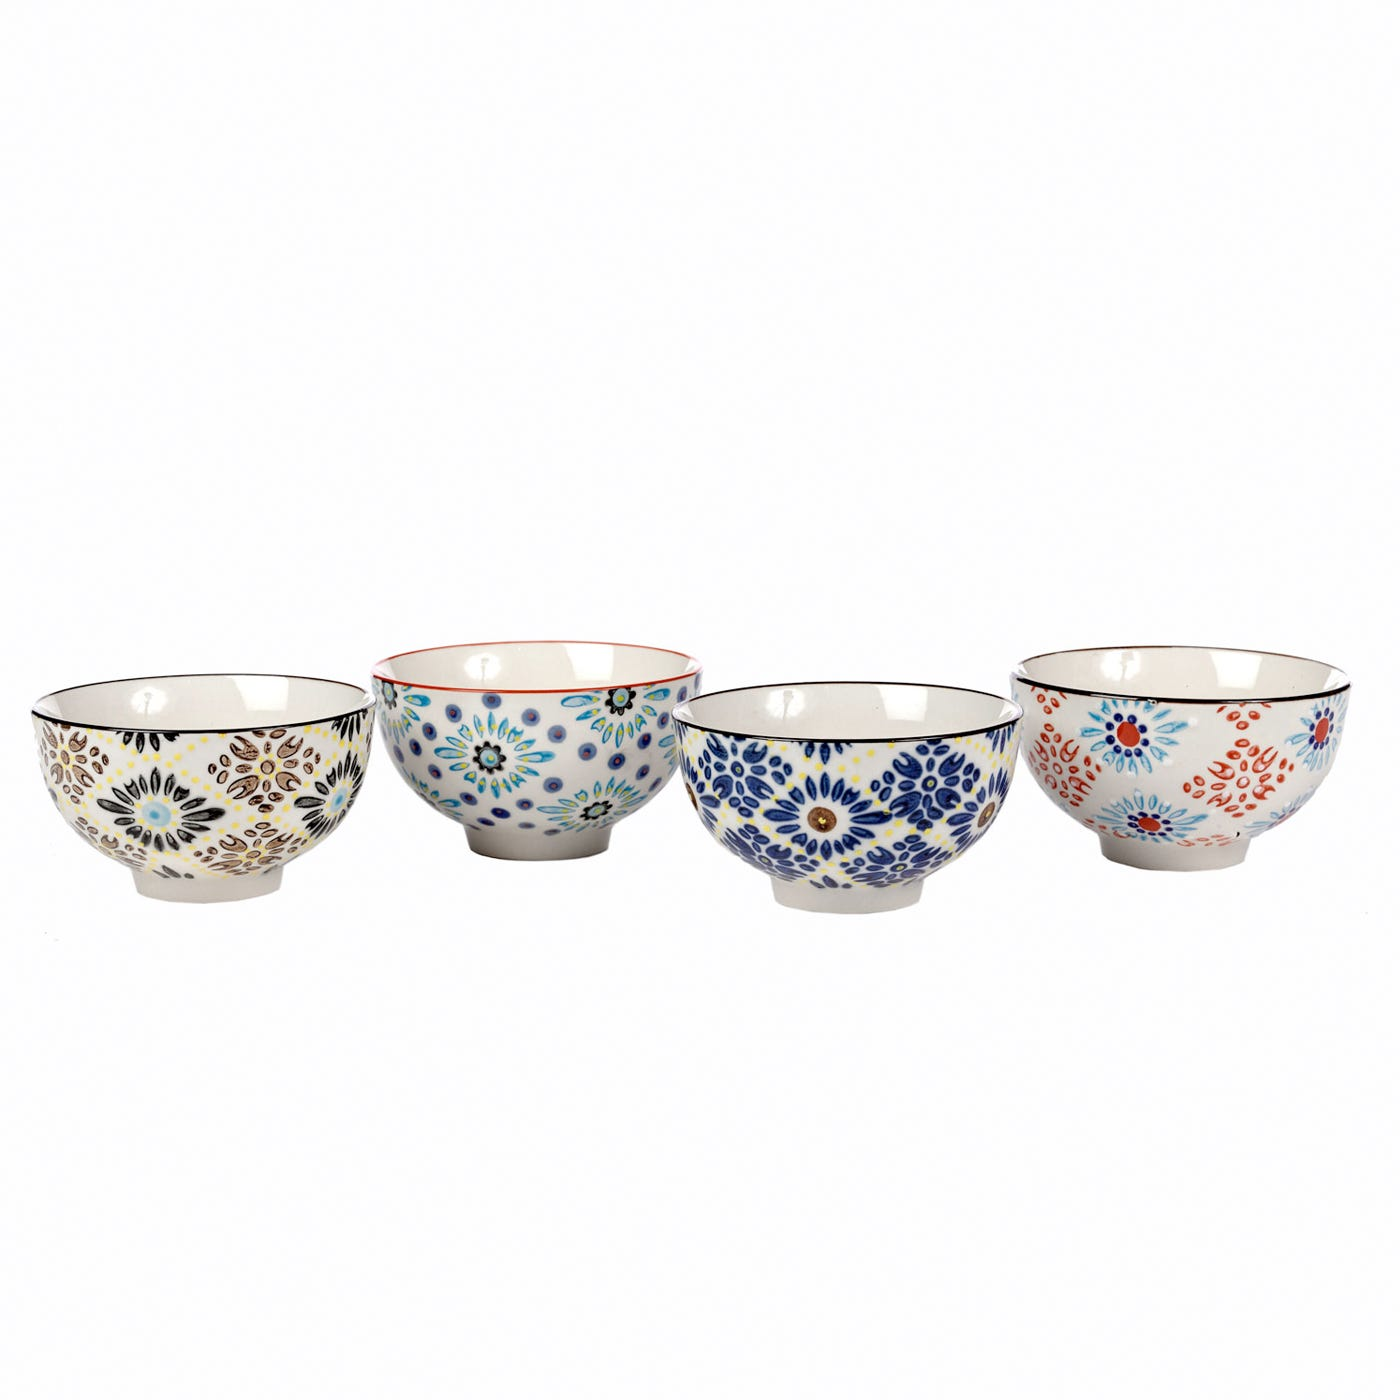 Pols Potten Mosaic Bowl Assorted Set of 4